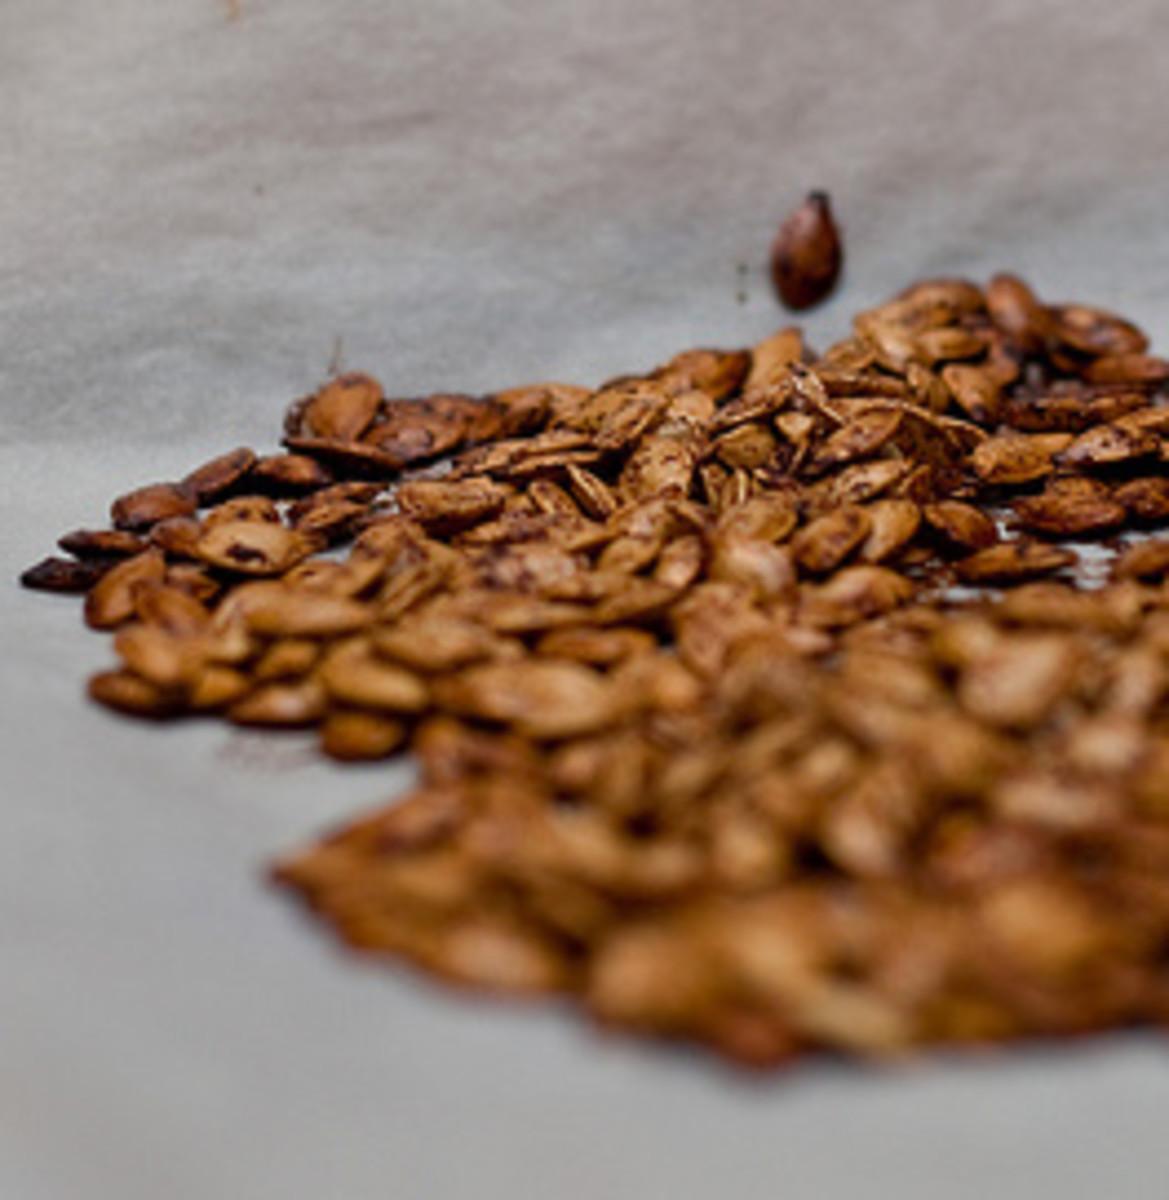 Roasted pumpkin seeds with cinnamon and brown sugar.